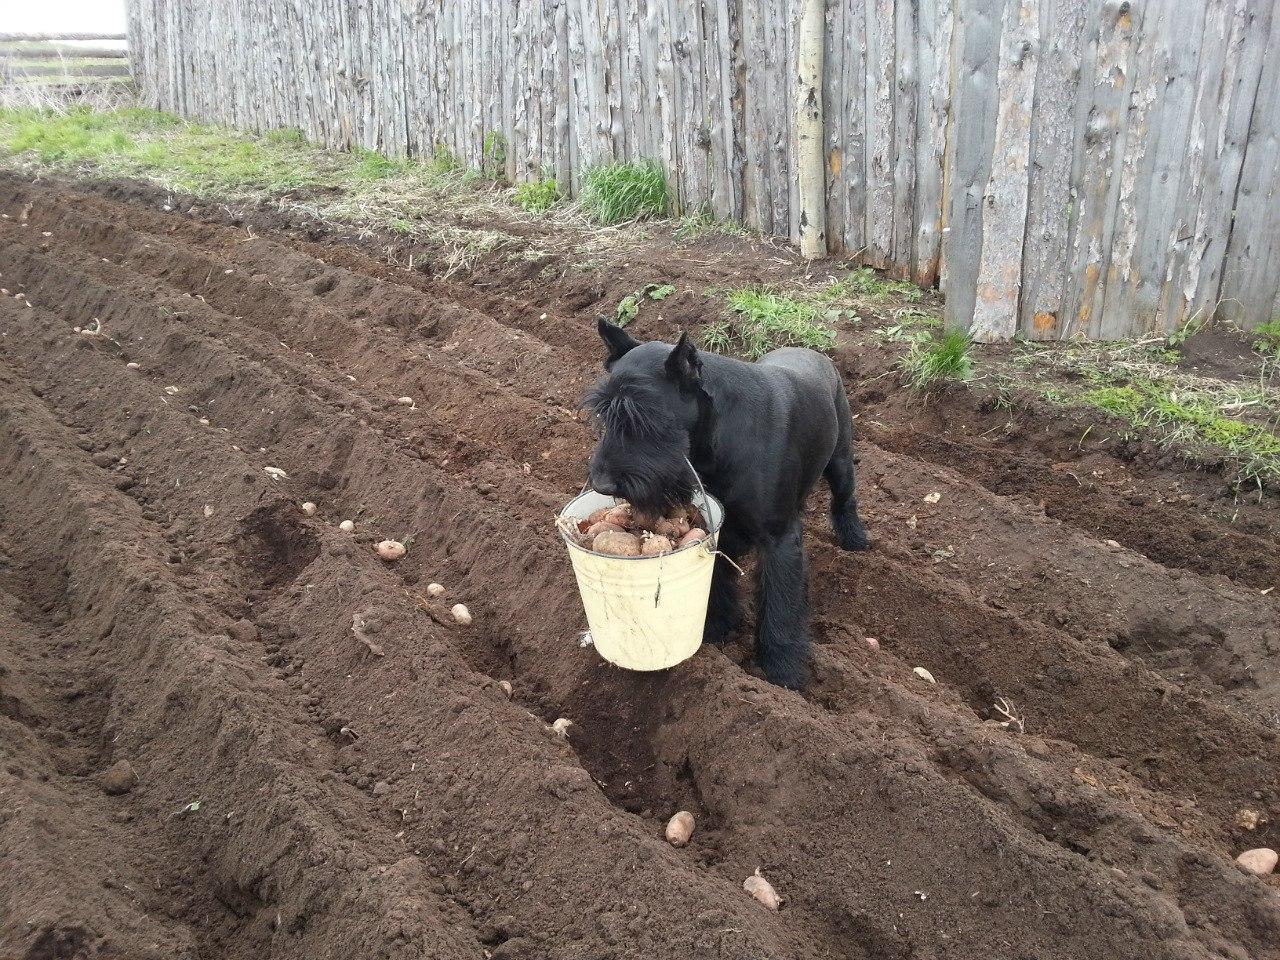 Limon helping to plant potatoes